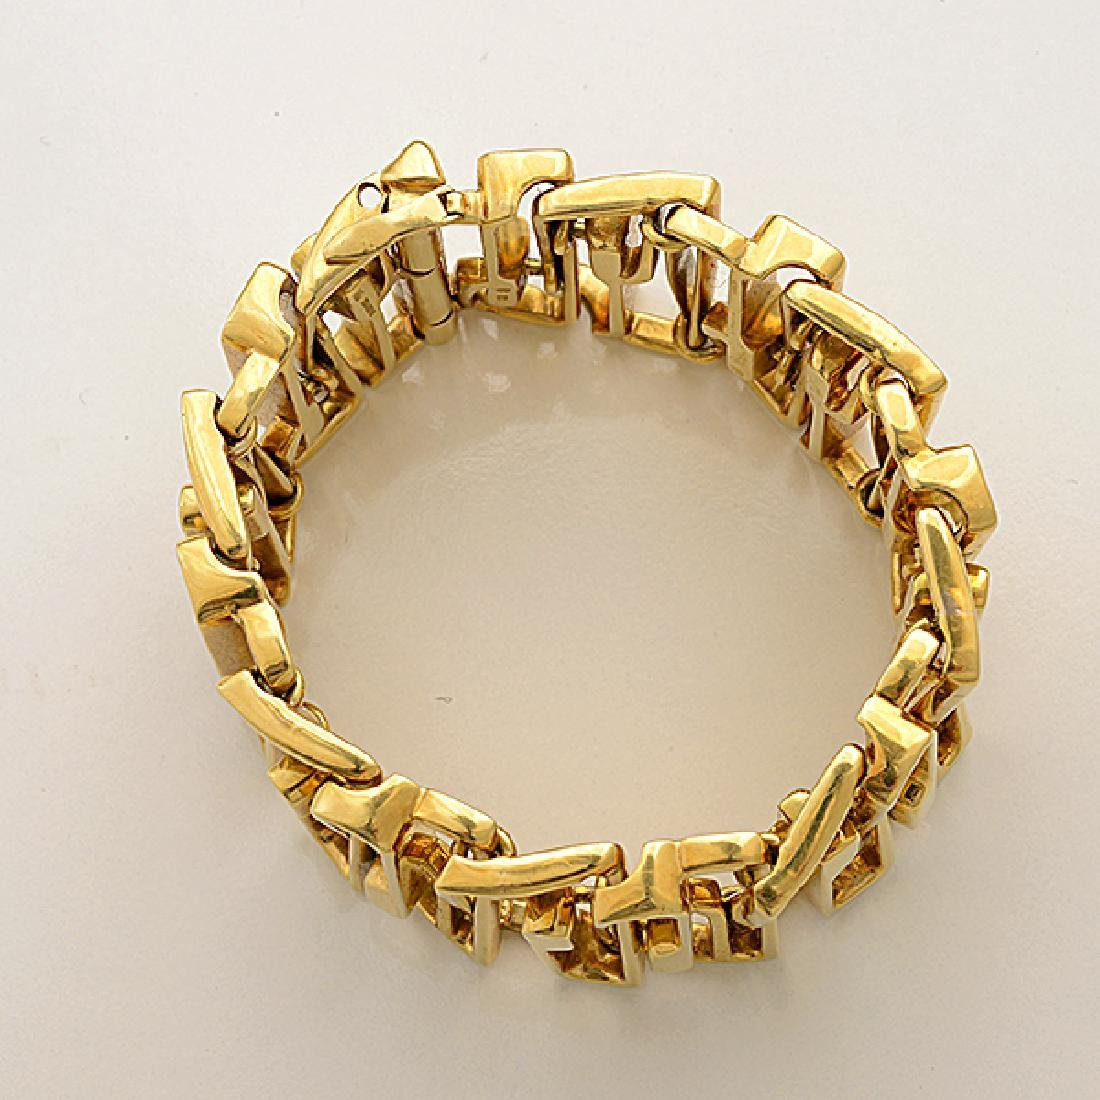 18k Yellow Gold Bracelet. - 3